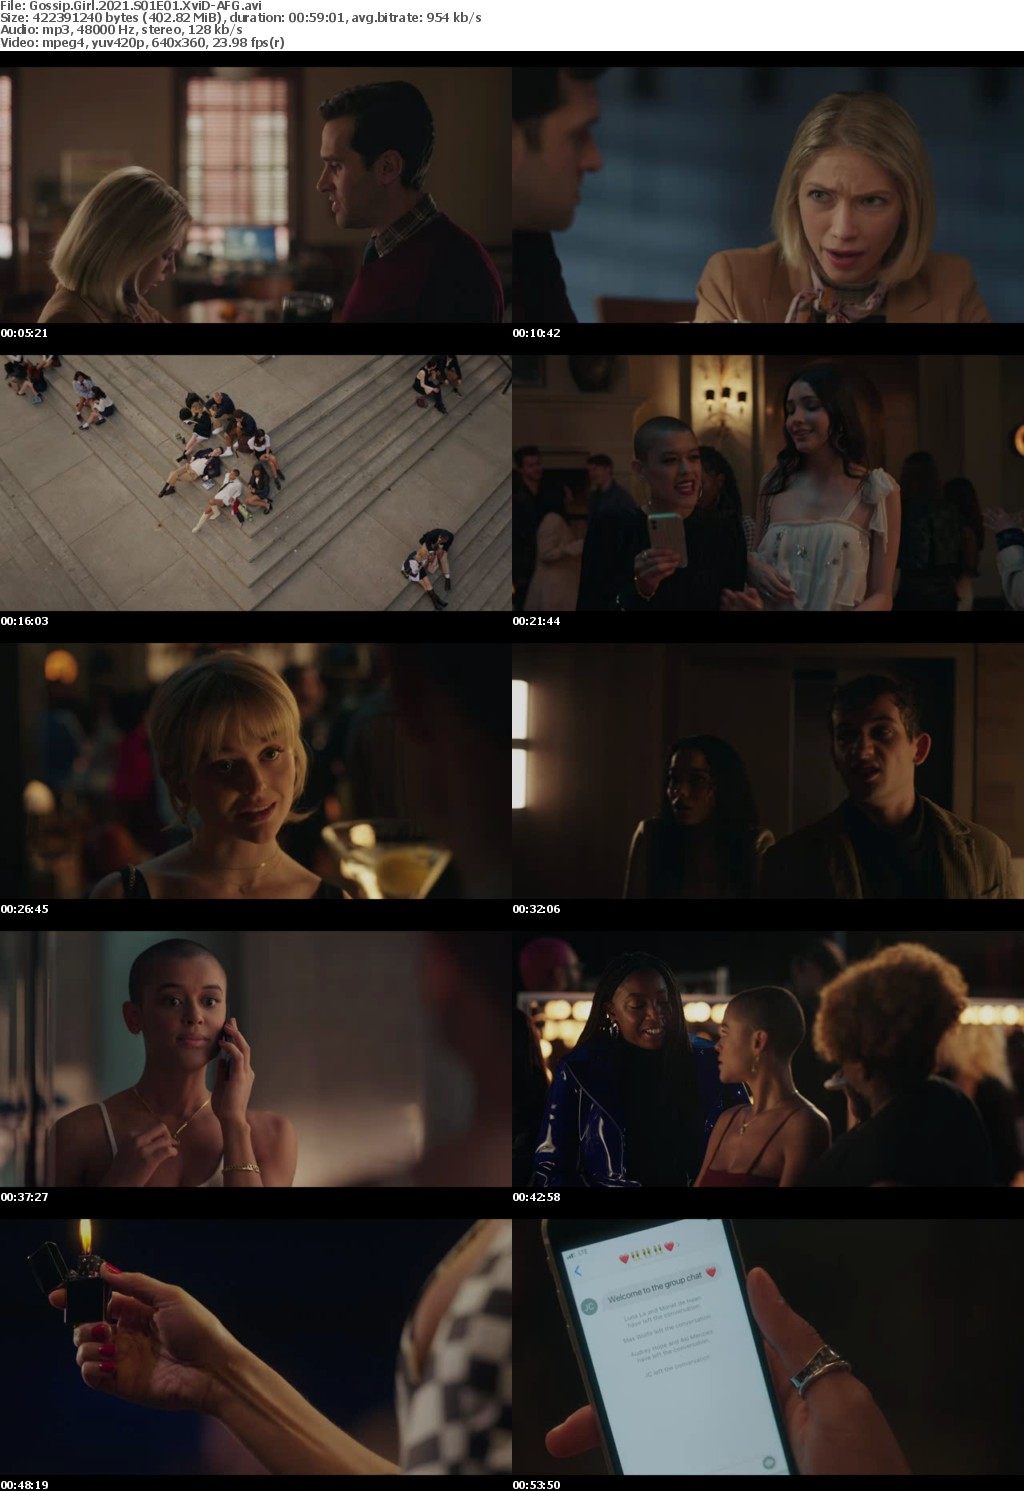 Gossip Girl 2021 S01E01 XviD-AFG